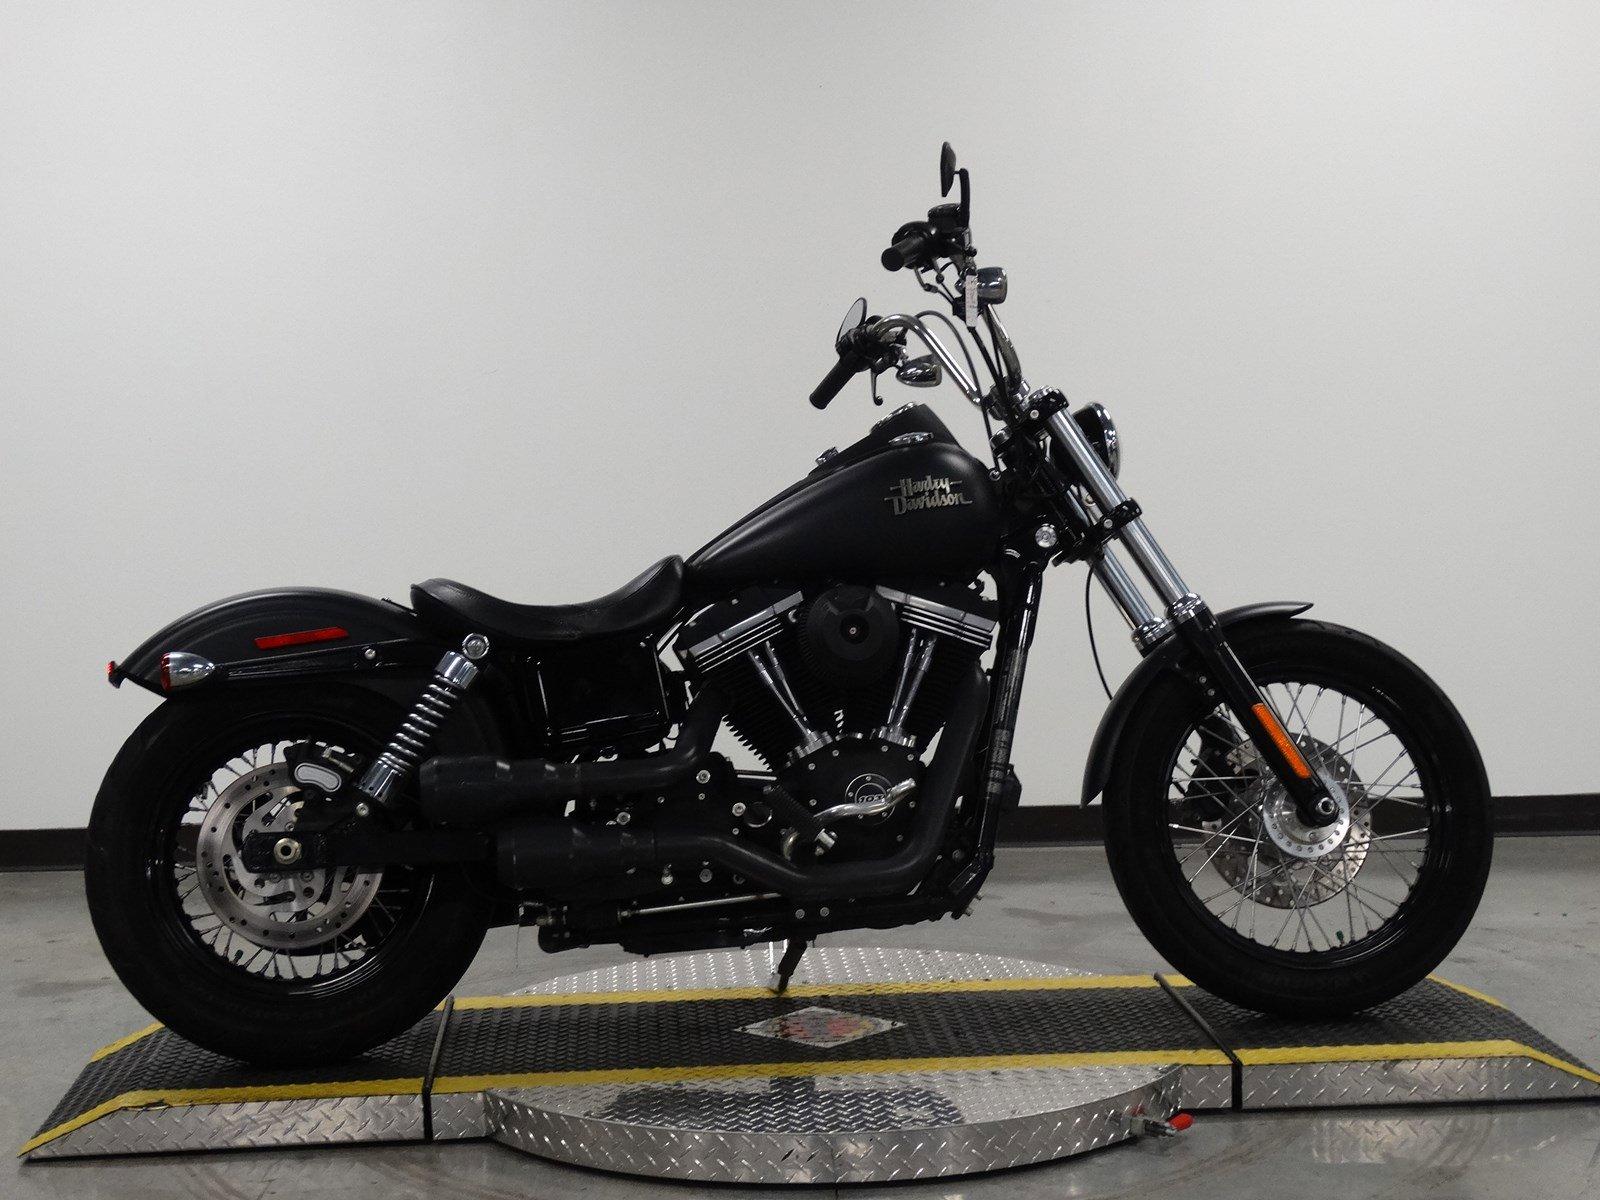 Pre-Owned 2015 Harley-Davidson Dyna Street Bob FXDB